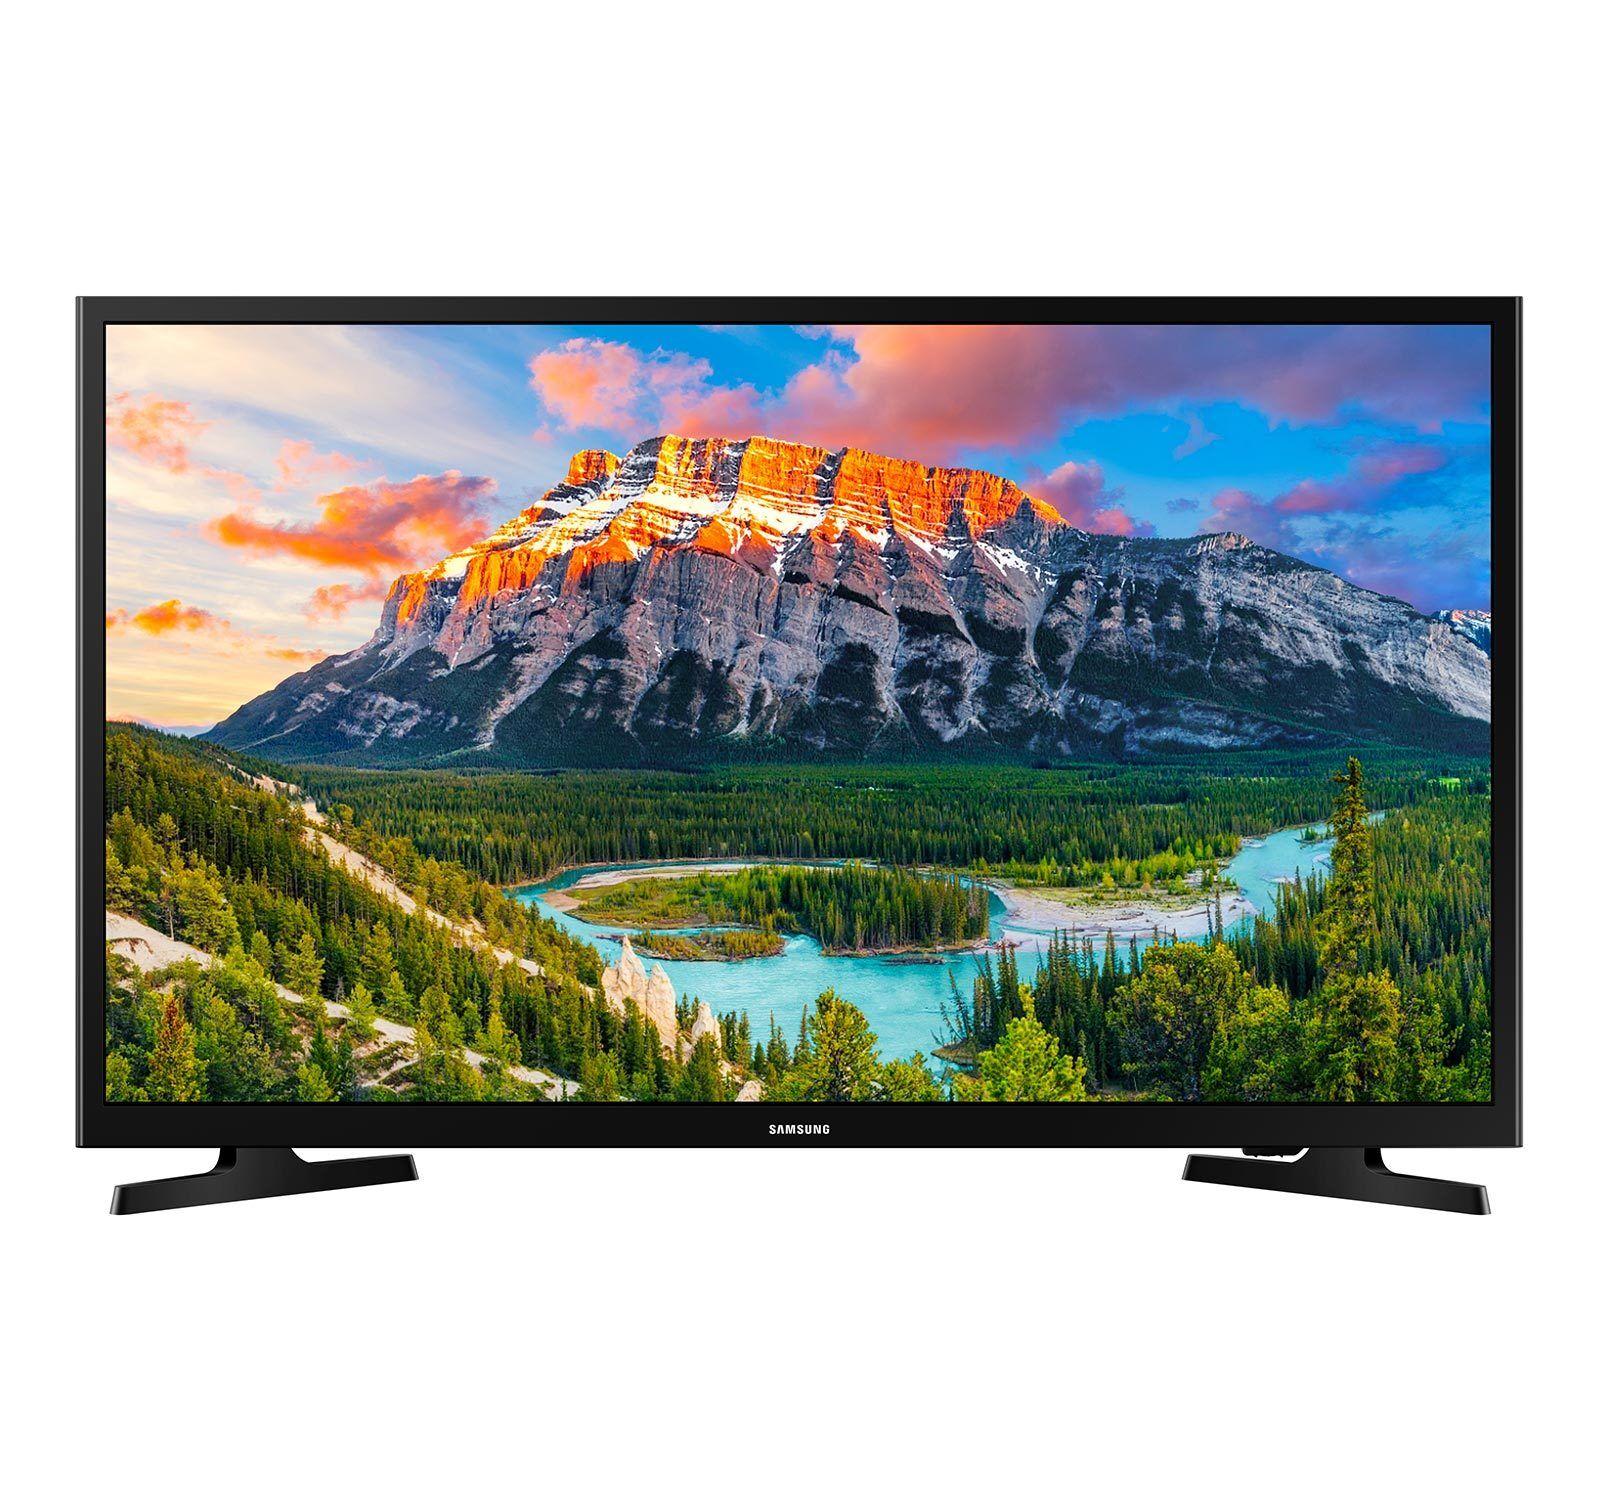 Samsung UN32N5300 32-inch HD LCD TV